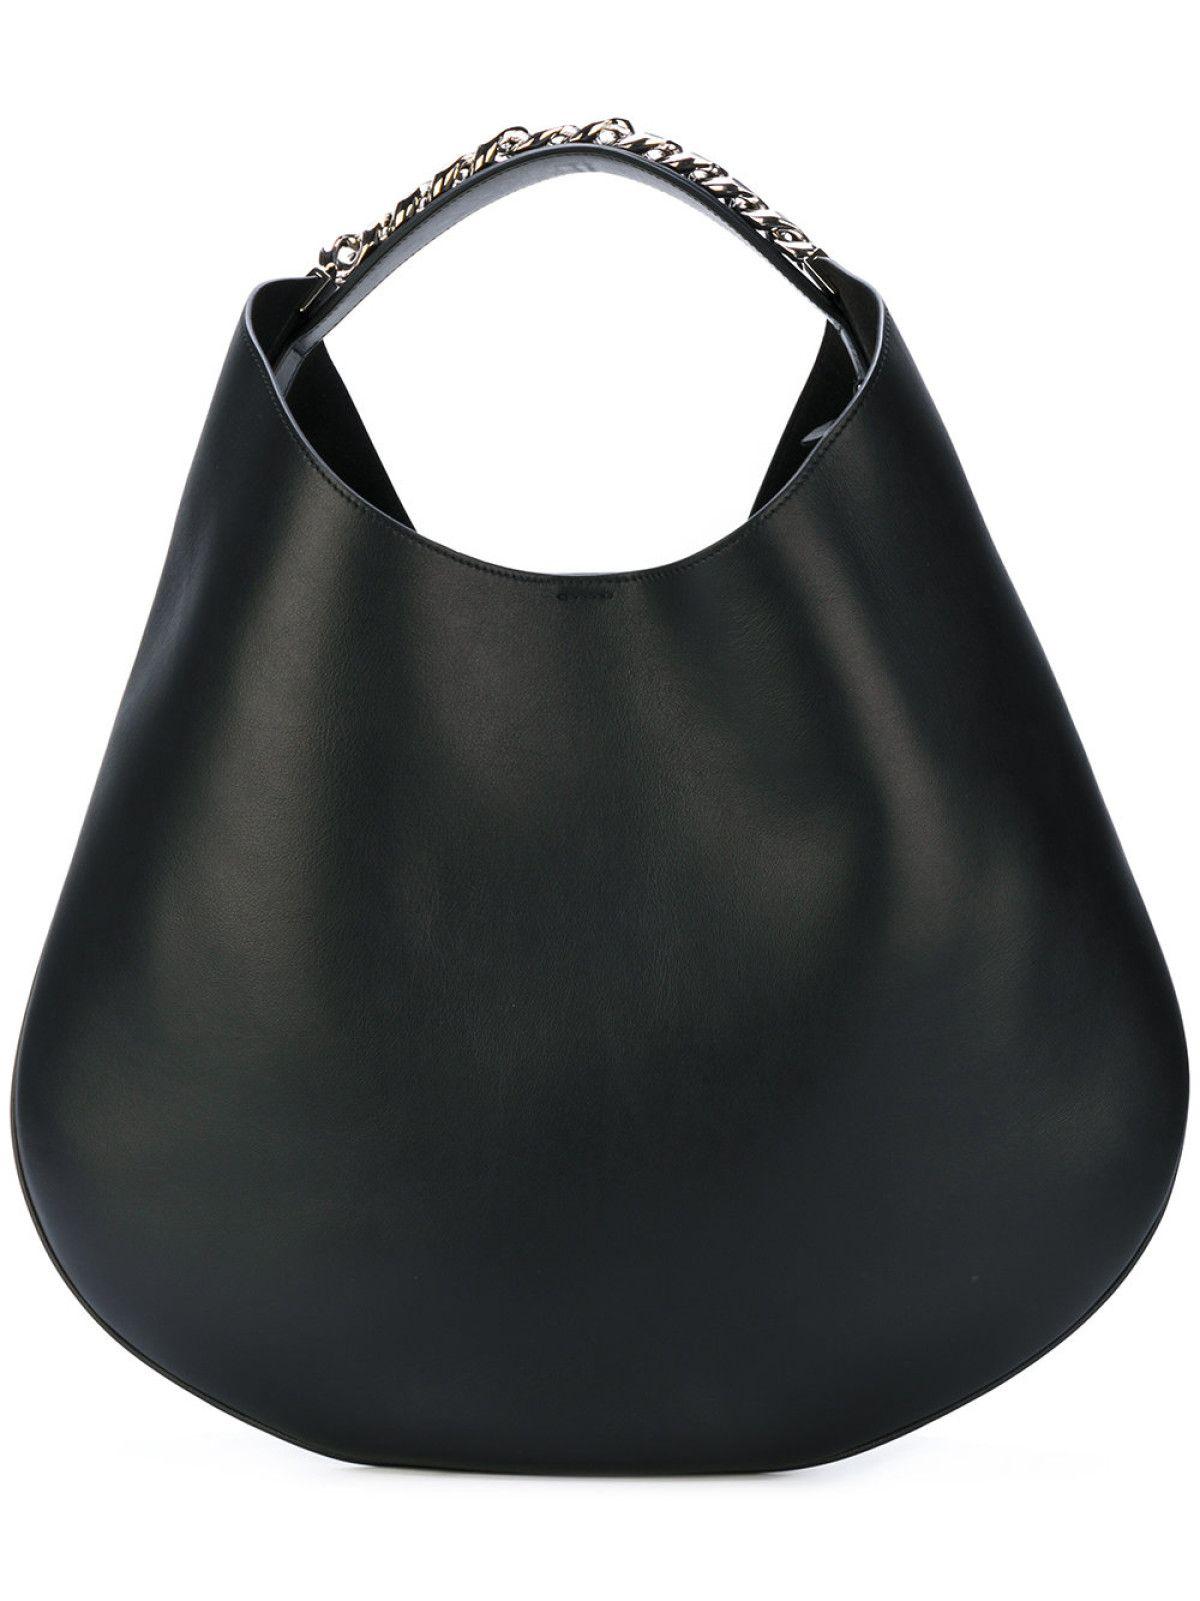 665d78db869  hobo bag  online shop  hobo  brand  Givenchy  Givenchybrand   فروشگاه اینترنتی  خرید اینترنتی  کیف  کیف زنانه  کیف زنانه  کیف هوبو  برند   برند ژیوانشی   ...